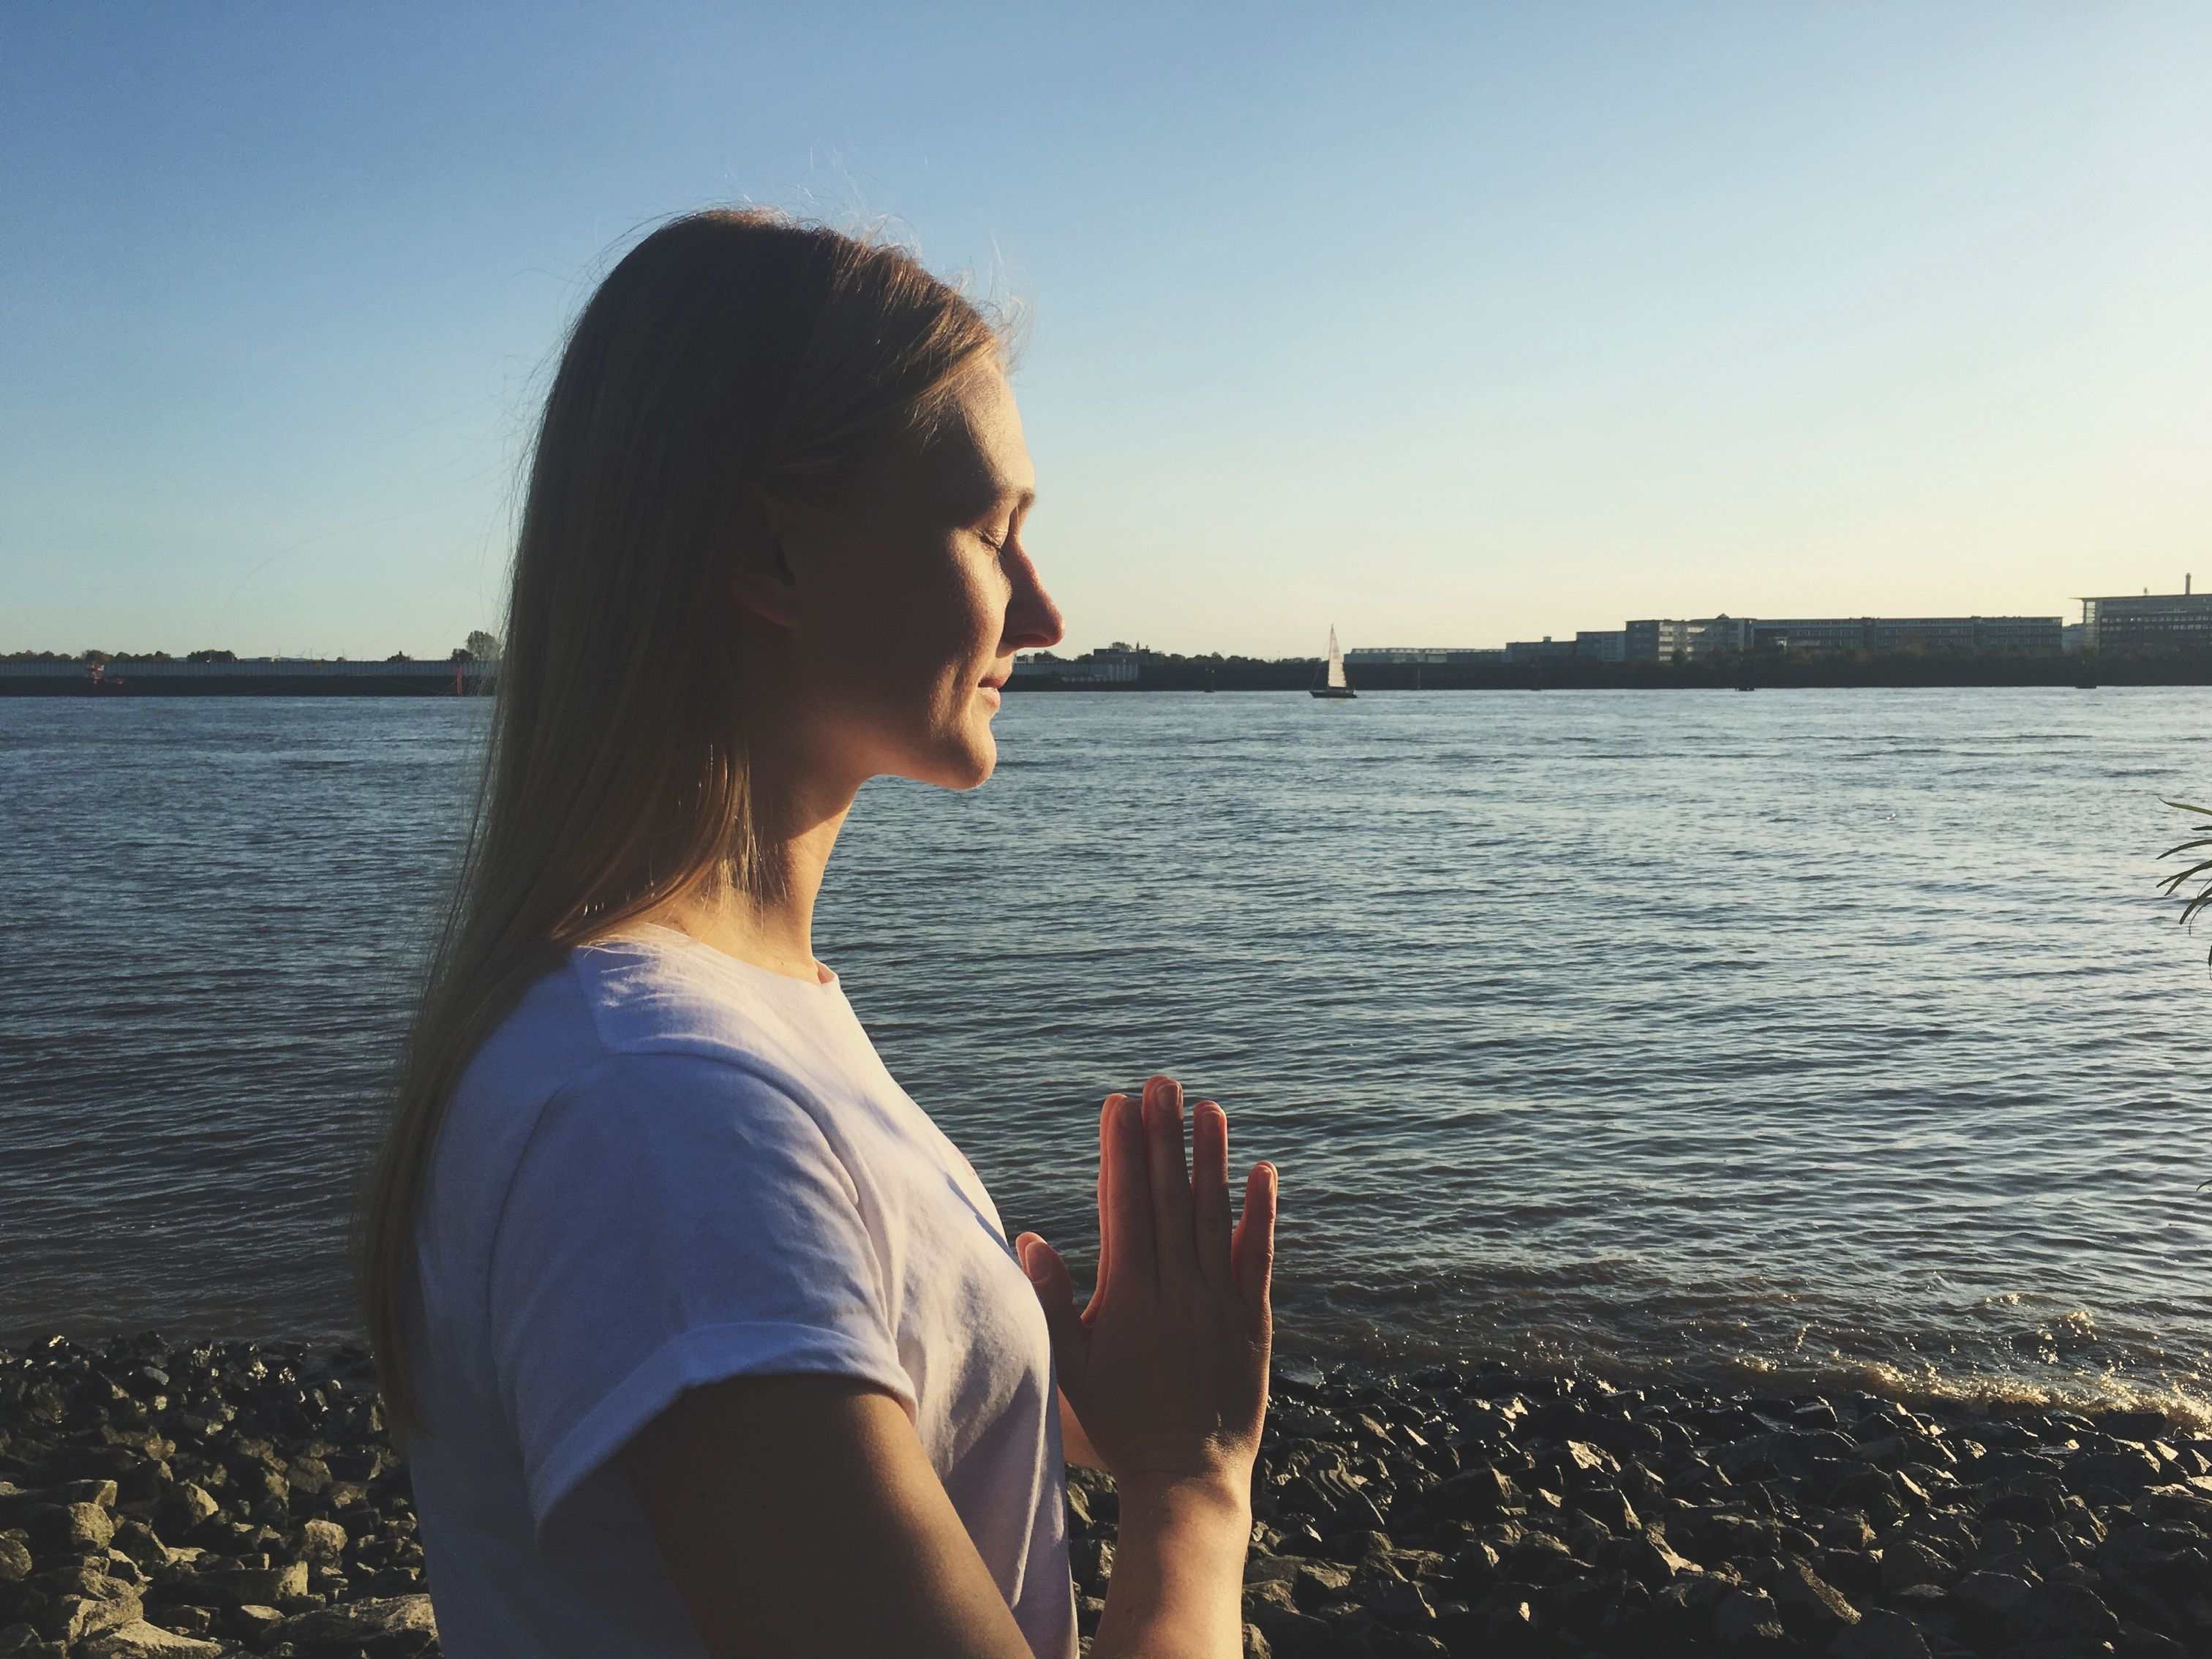 Persönliche_Entwicklung_Yoga_Meditation_Gedanken_Atmung_Ruhe_Natur_Oh_Yes_Yoga